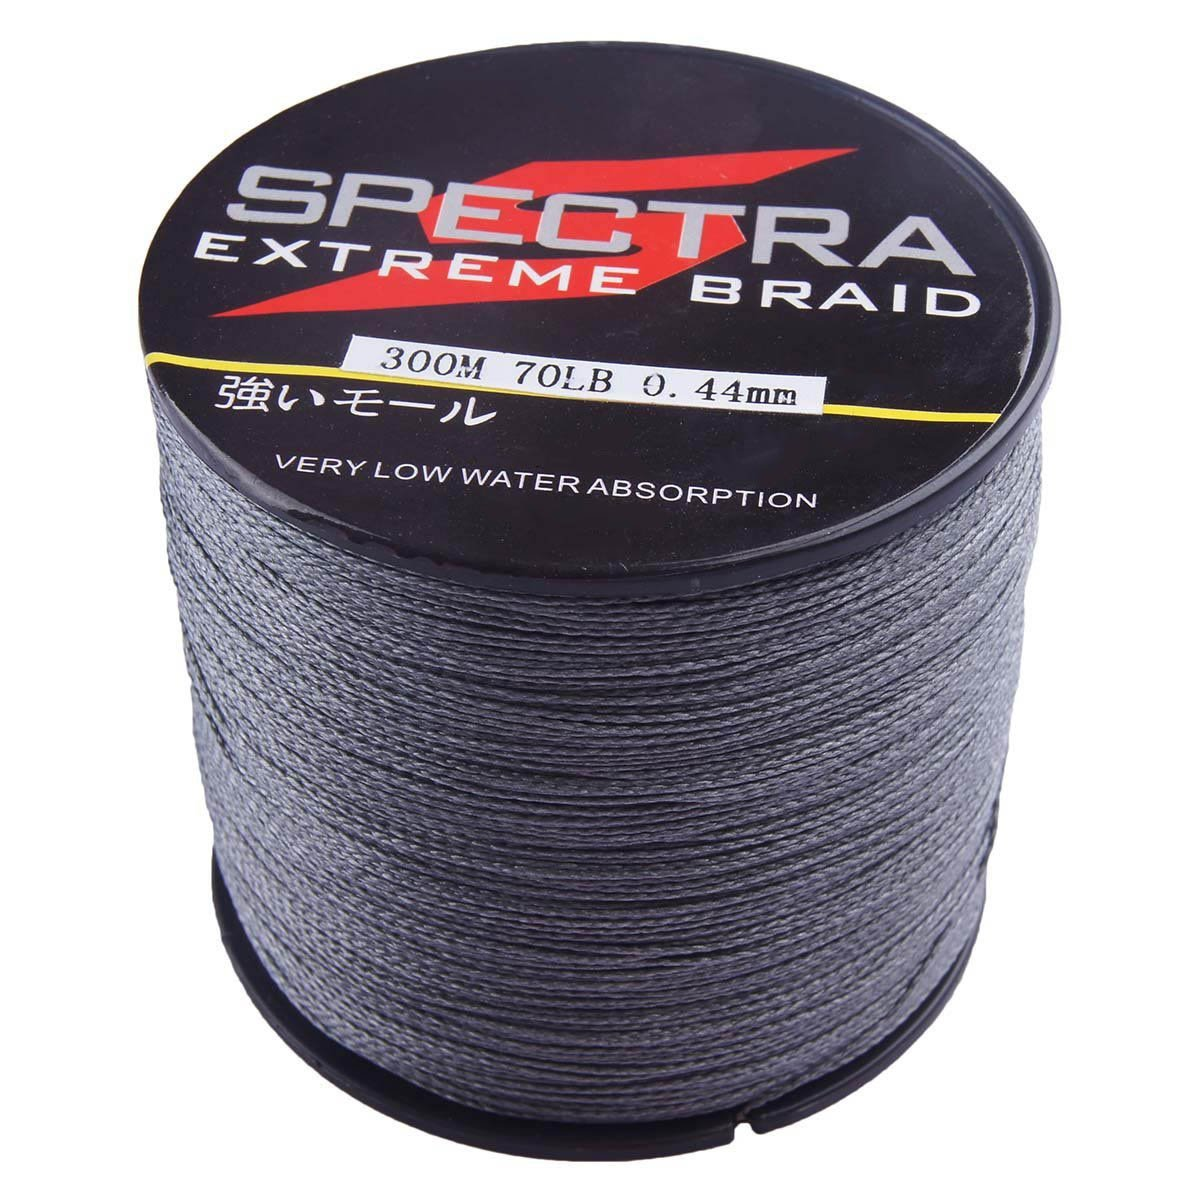 Generic pe spectra dyneema braid fishing line 100m 300m for Spectra fishing line